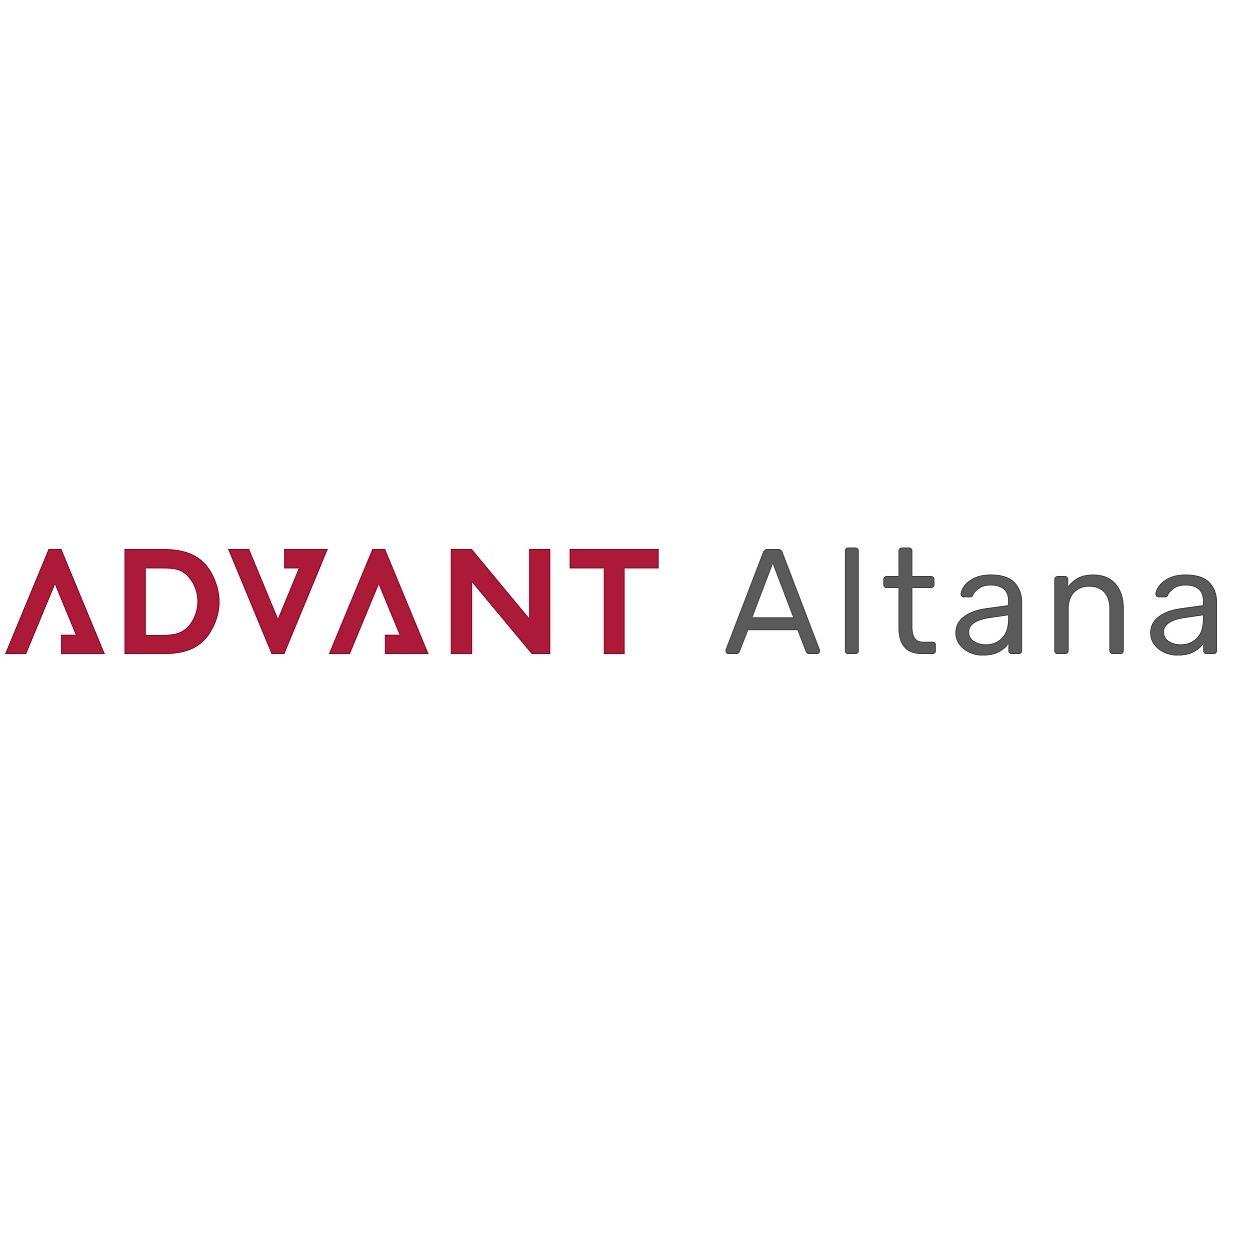 the Advant Altana logo.